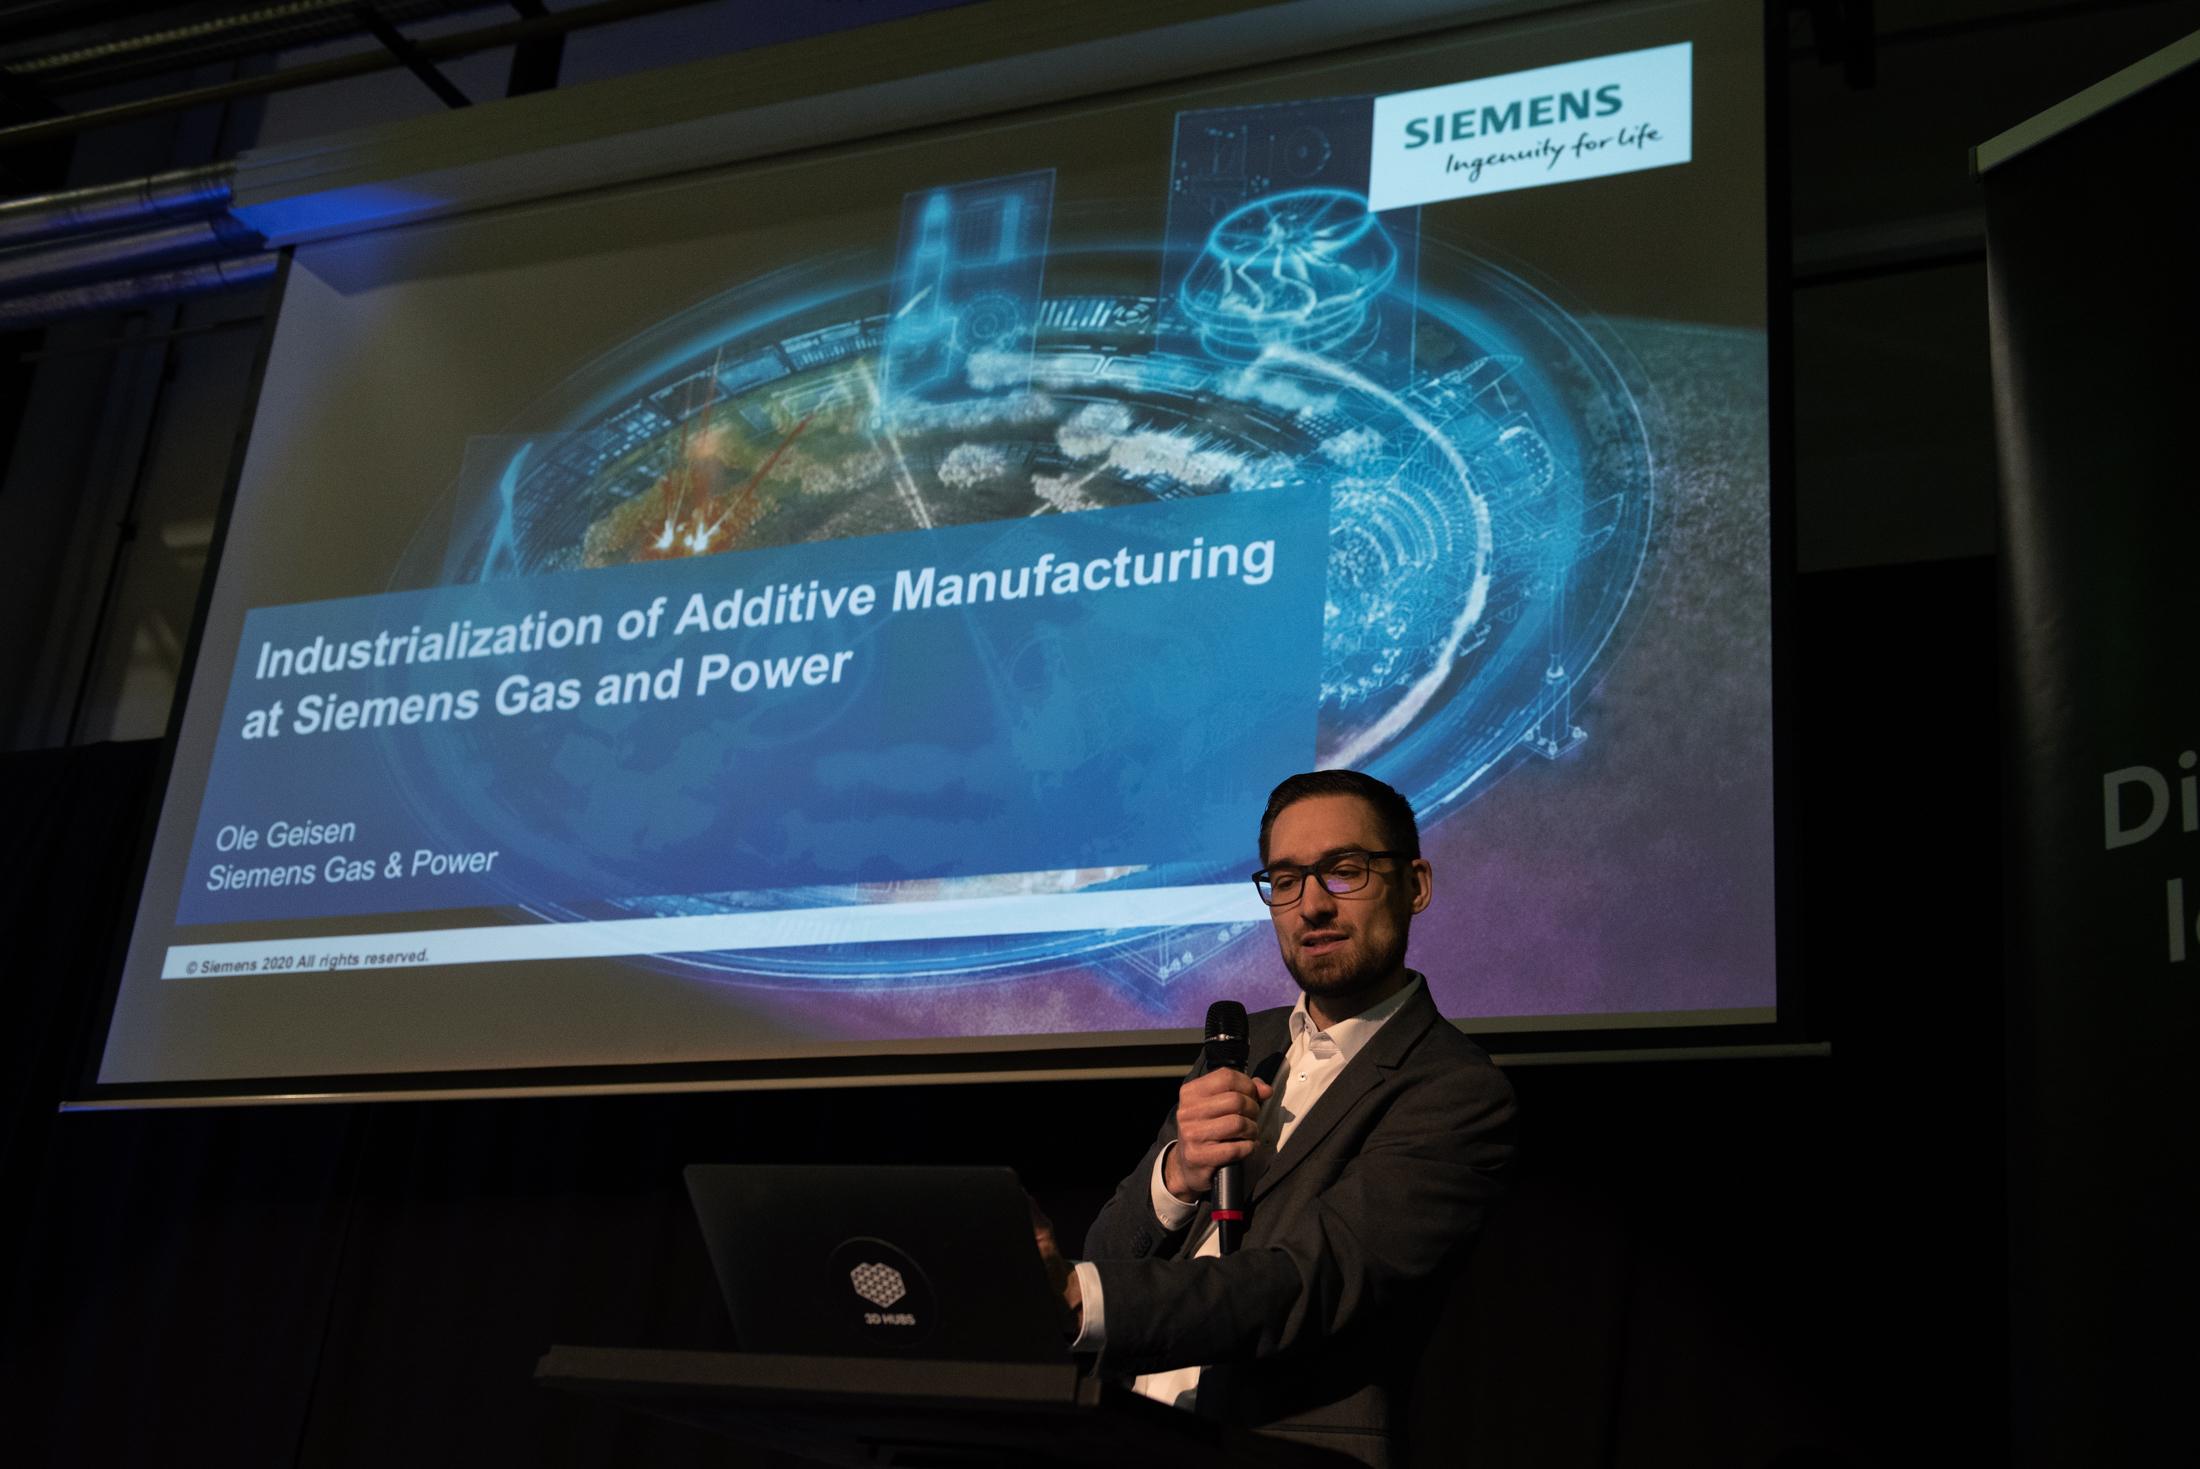 3D Hubs bringt revolutionäre, digitale Fertigungsplattform nach Deutschland